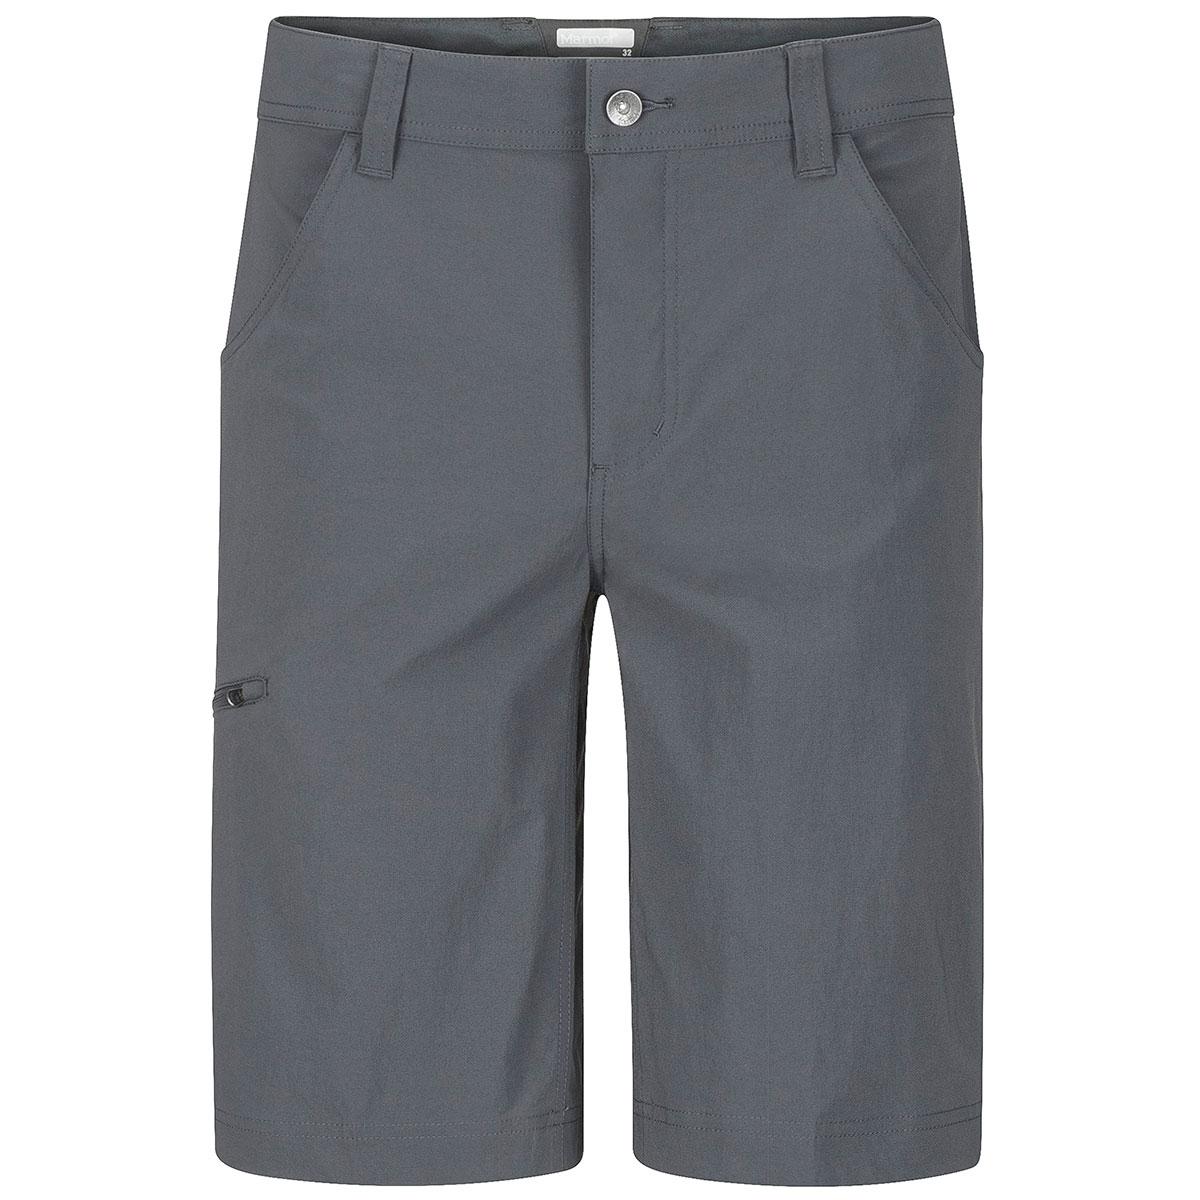 Marmot Men's Arch Rock Shorts - Black, 30